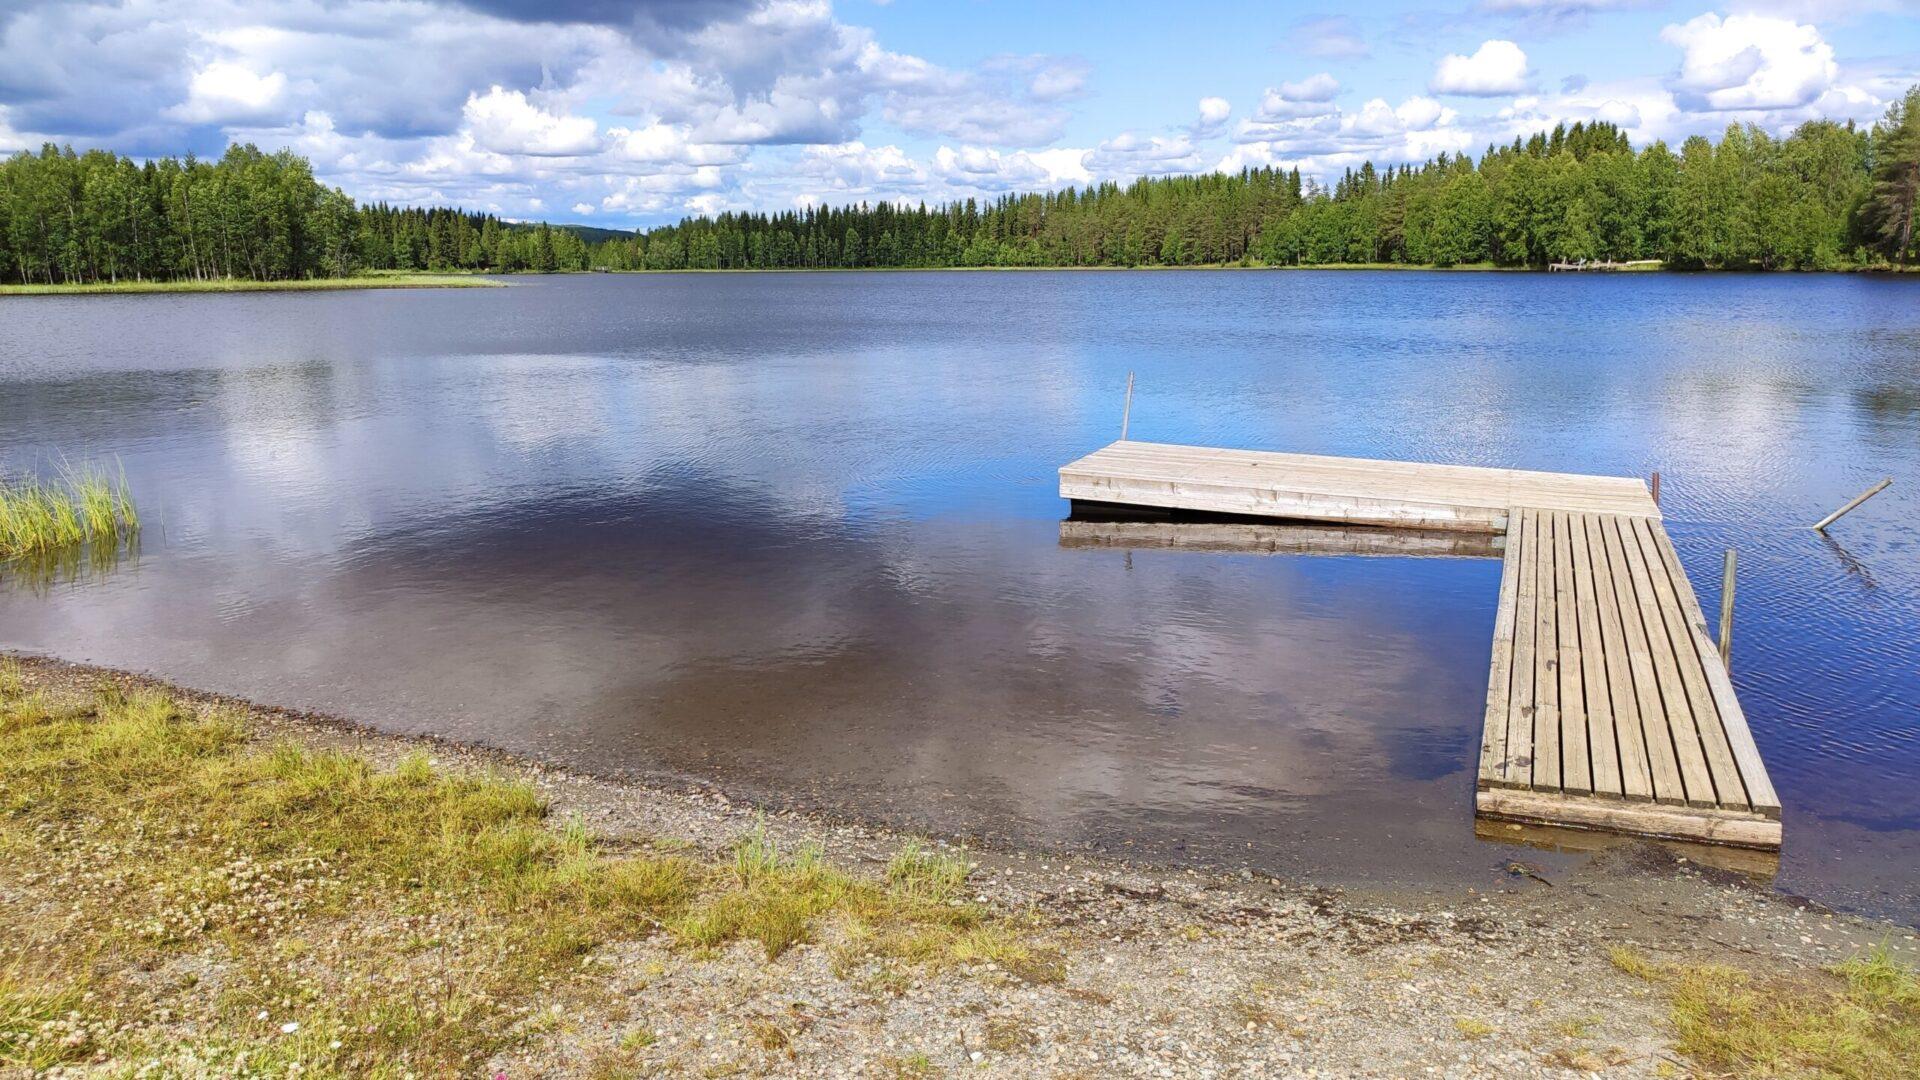 Skansholm badplats